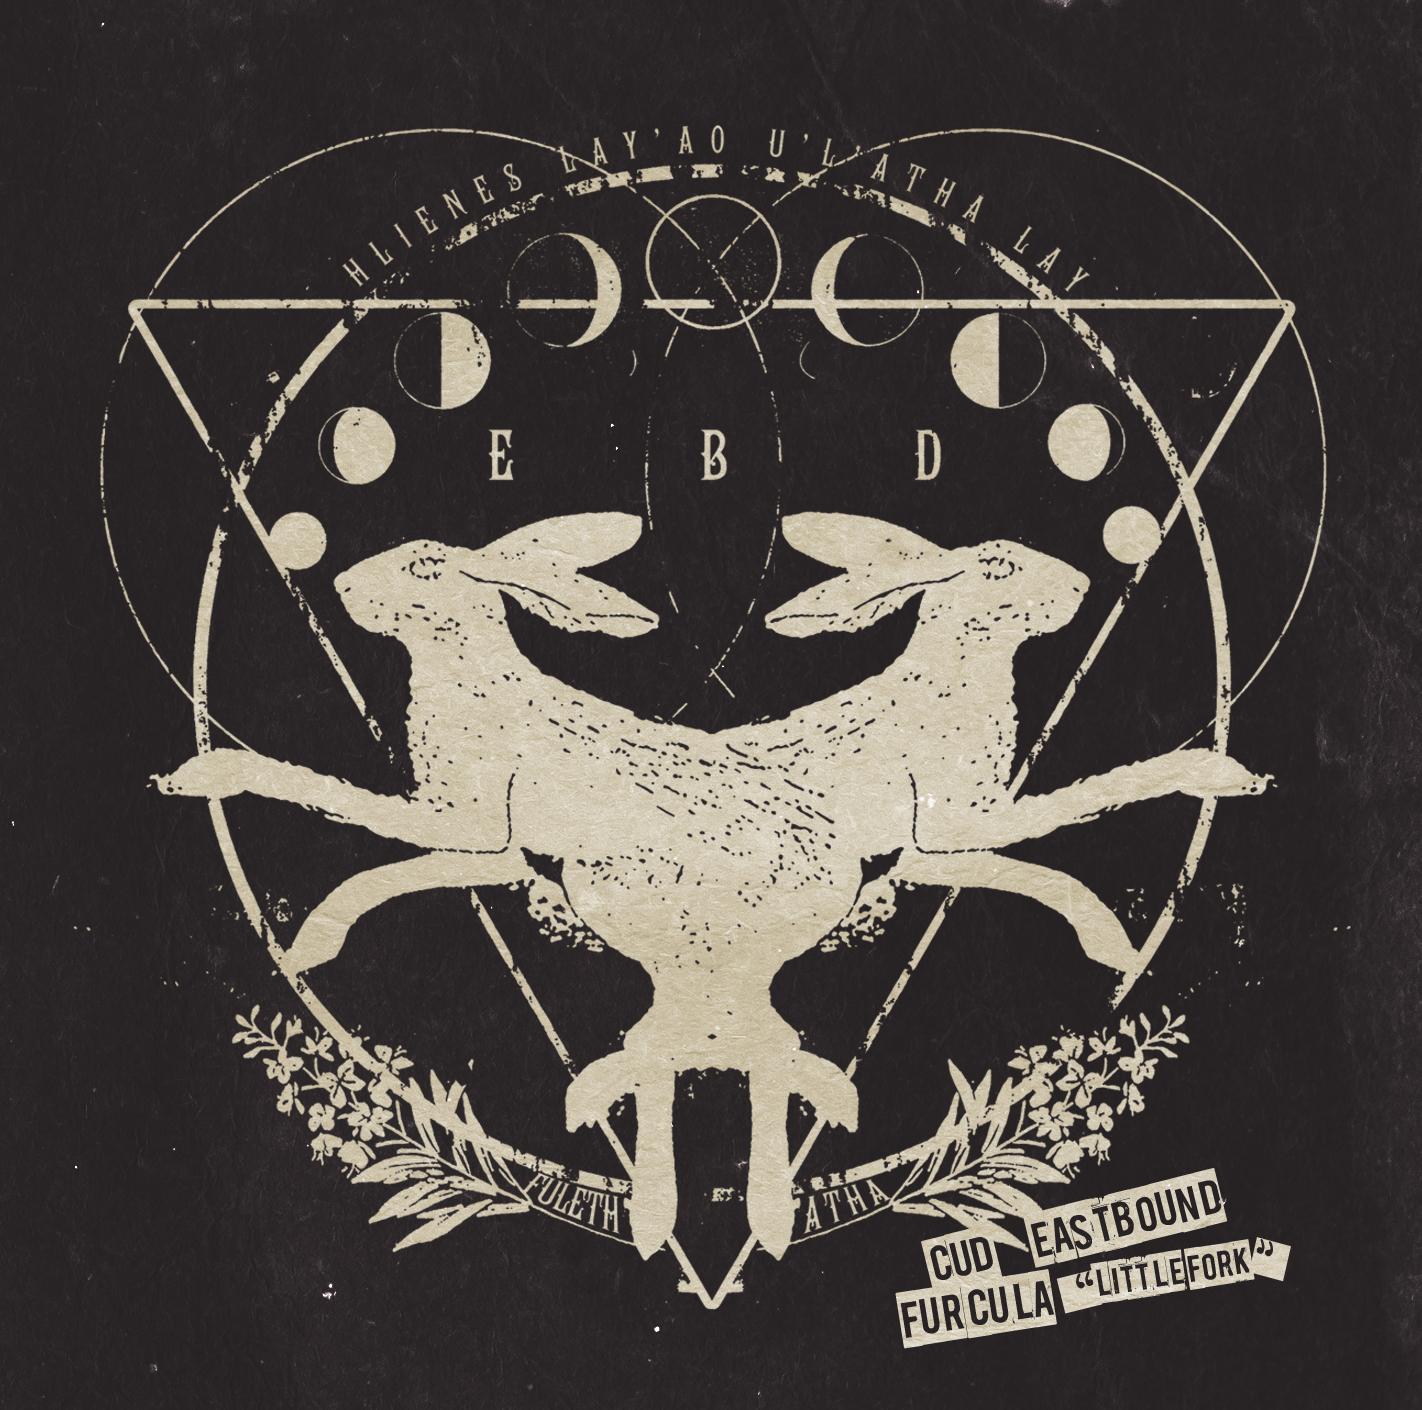 Cud Eastbound Furcula Album Cover, DIY Folk from Halifax, Nova Scotia, Canada